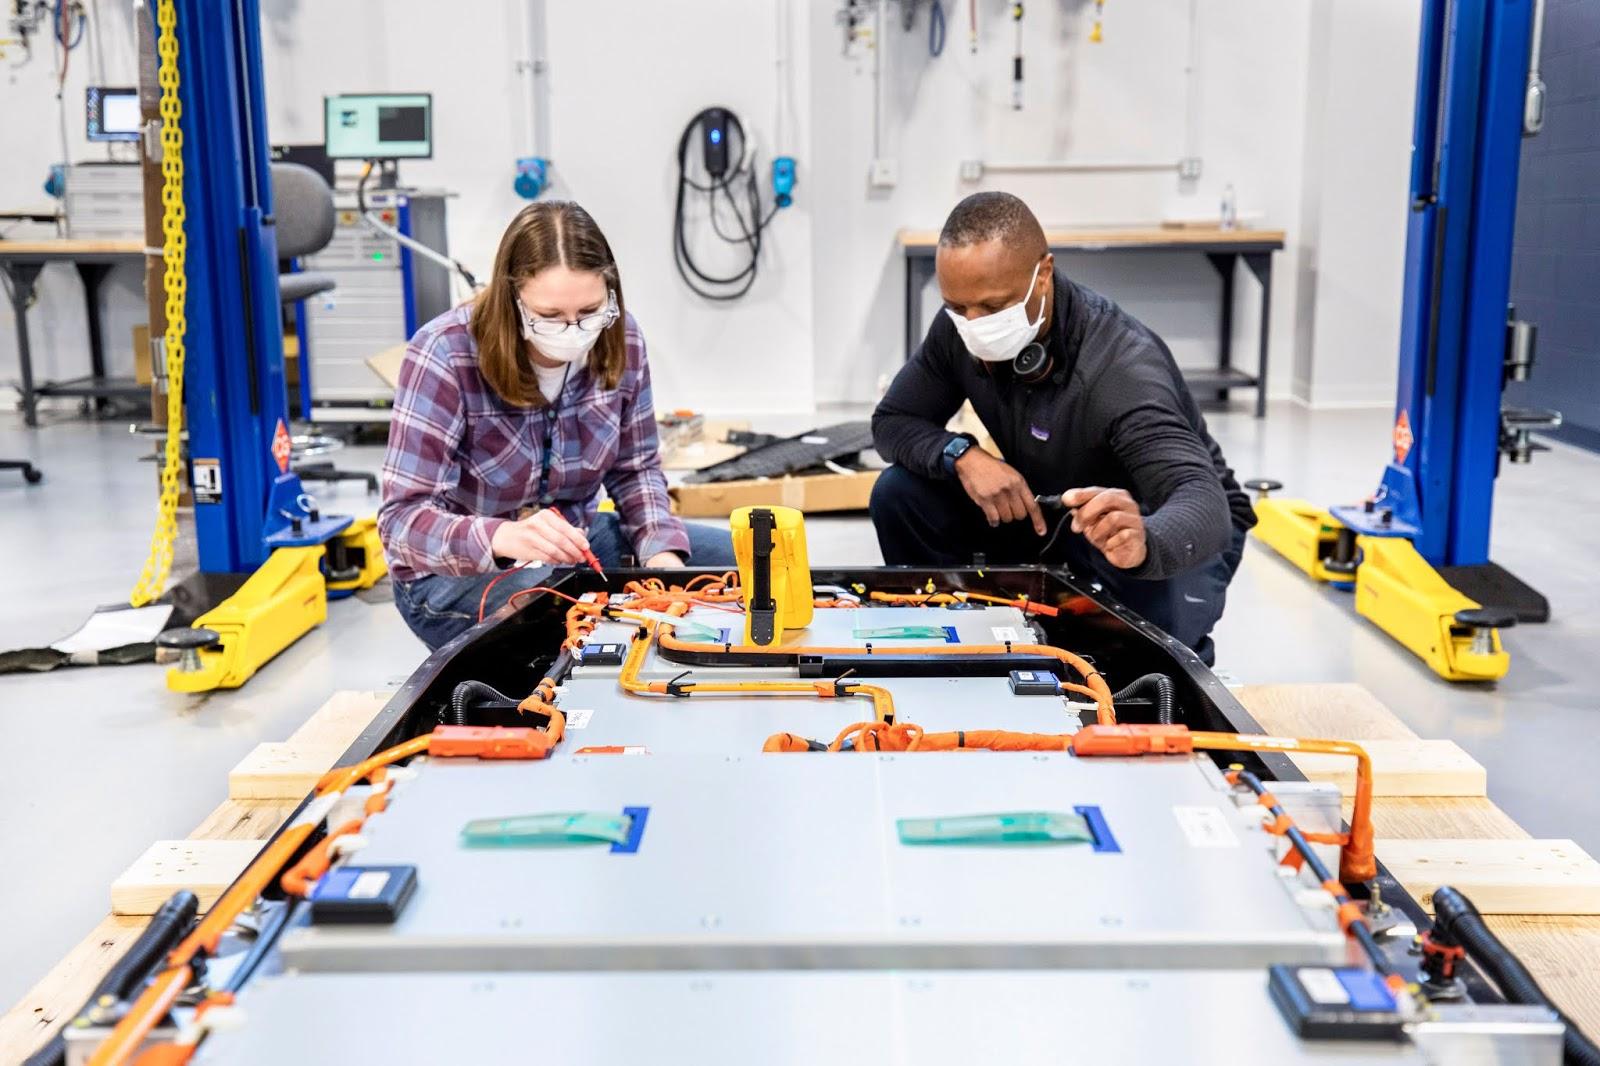 BatteryFacility AllenPark 11 1 Ford Ion Park : Επιταχύνει την έρευνα και εξέλιξη στον τομέα των μπαταριών